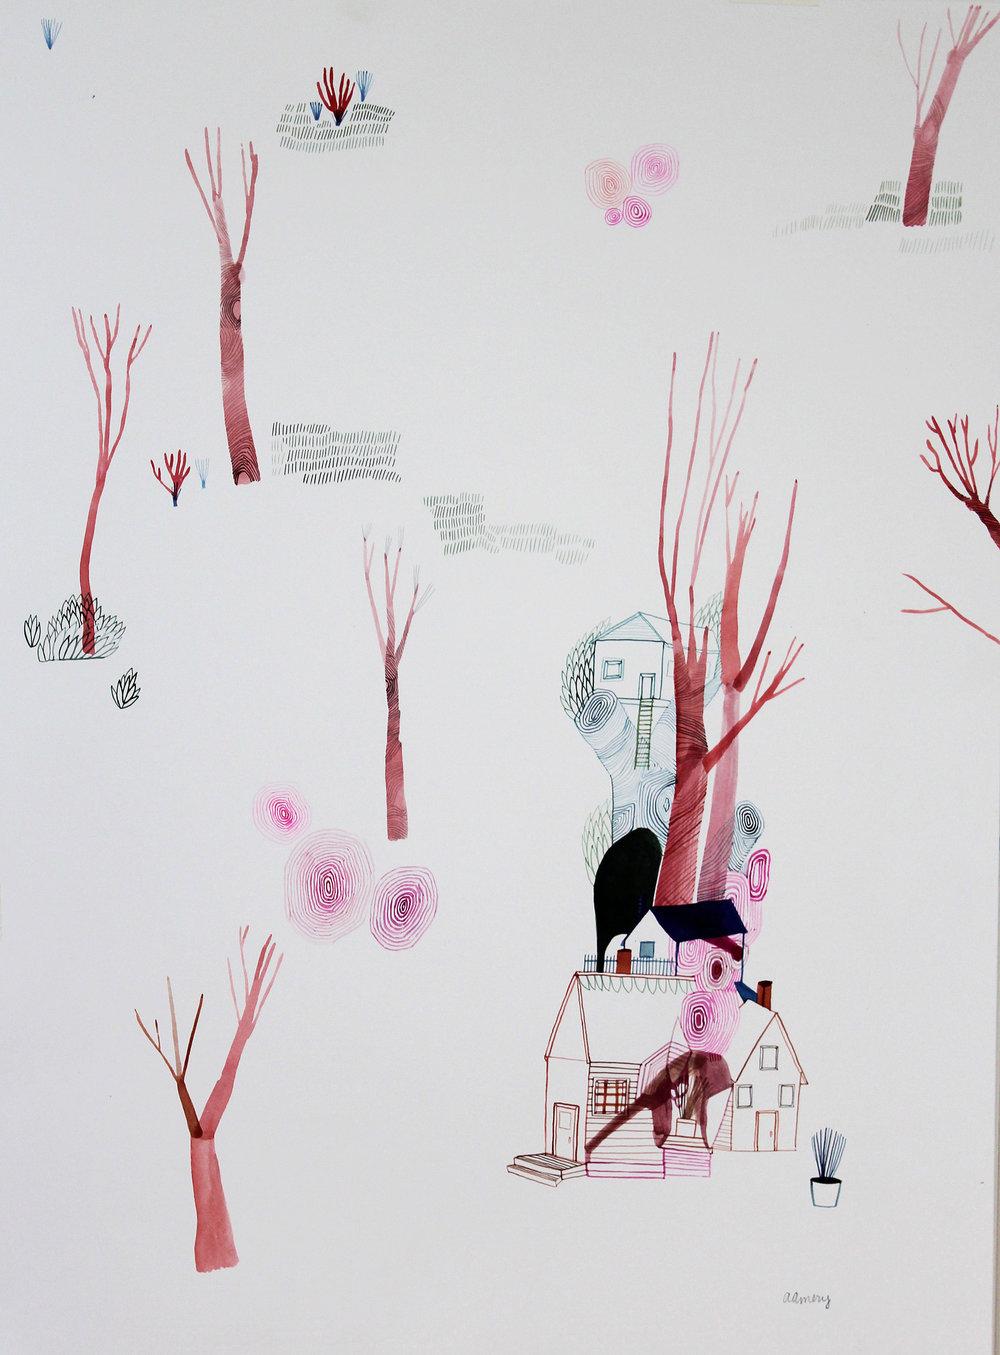 Winter Tree House , Ashley Amery. 2017, Gouache on paper, 56 x 76 cm